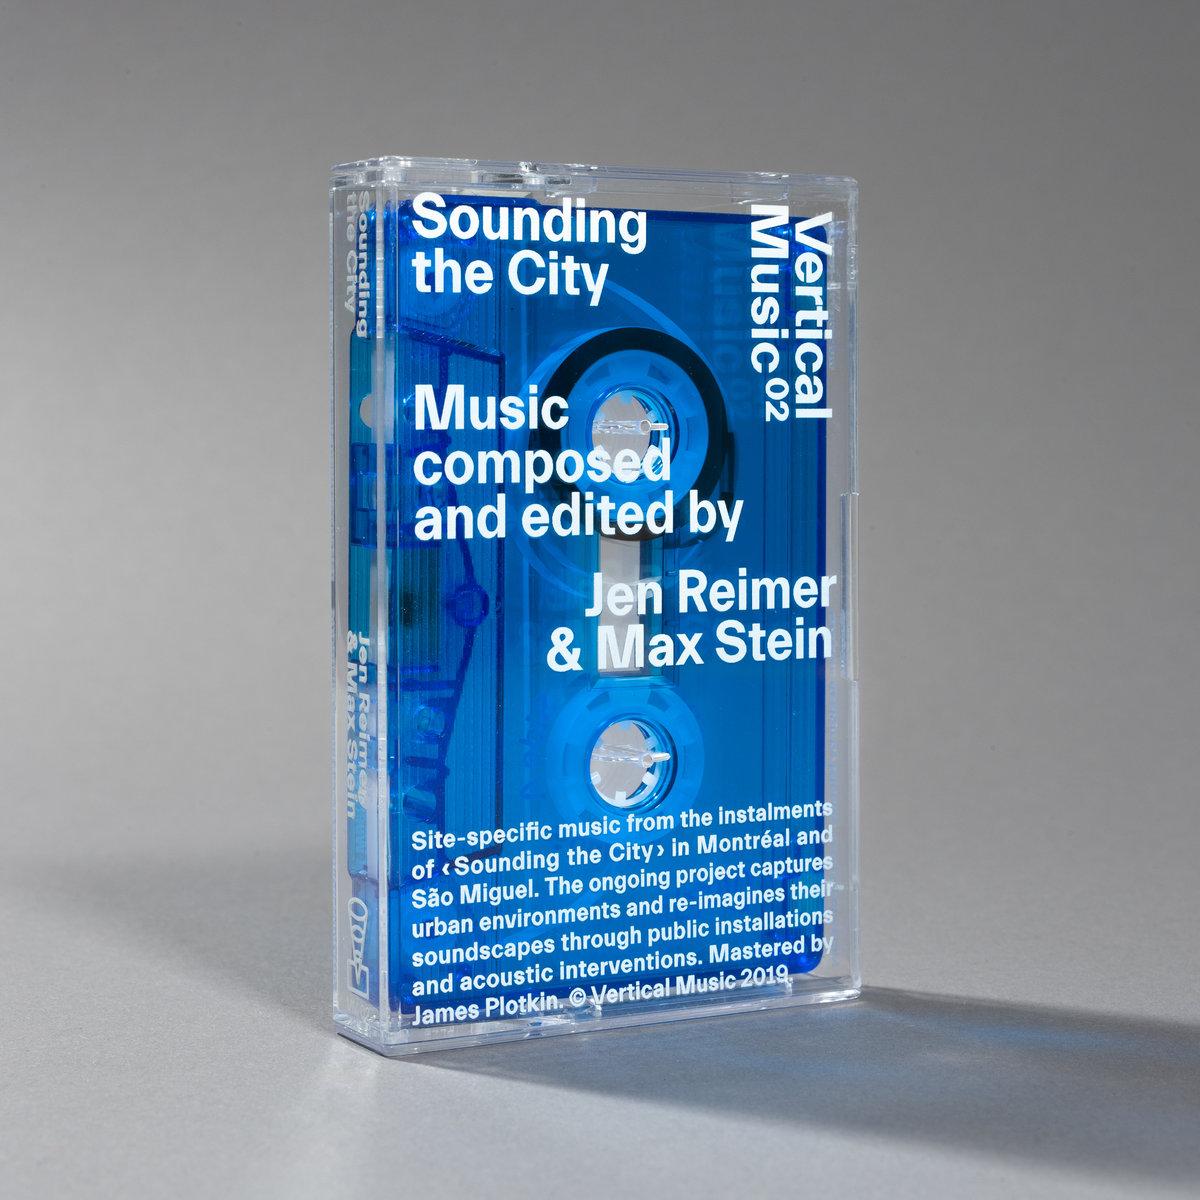 Sounding the City 001-002 — Jen Reimer & Max Stein